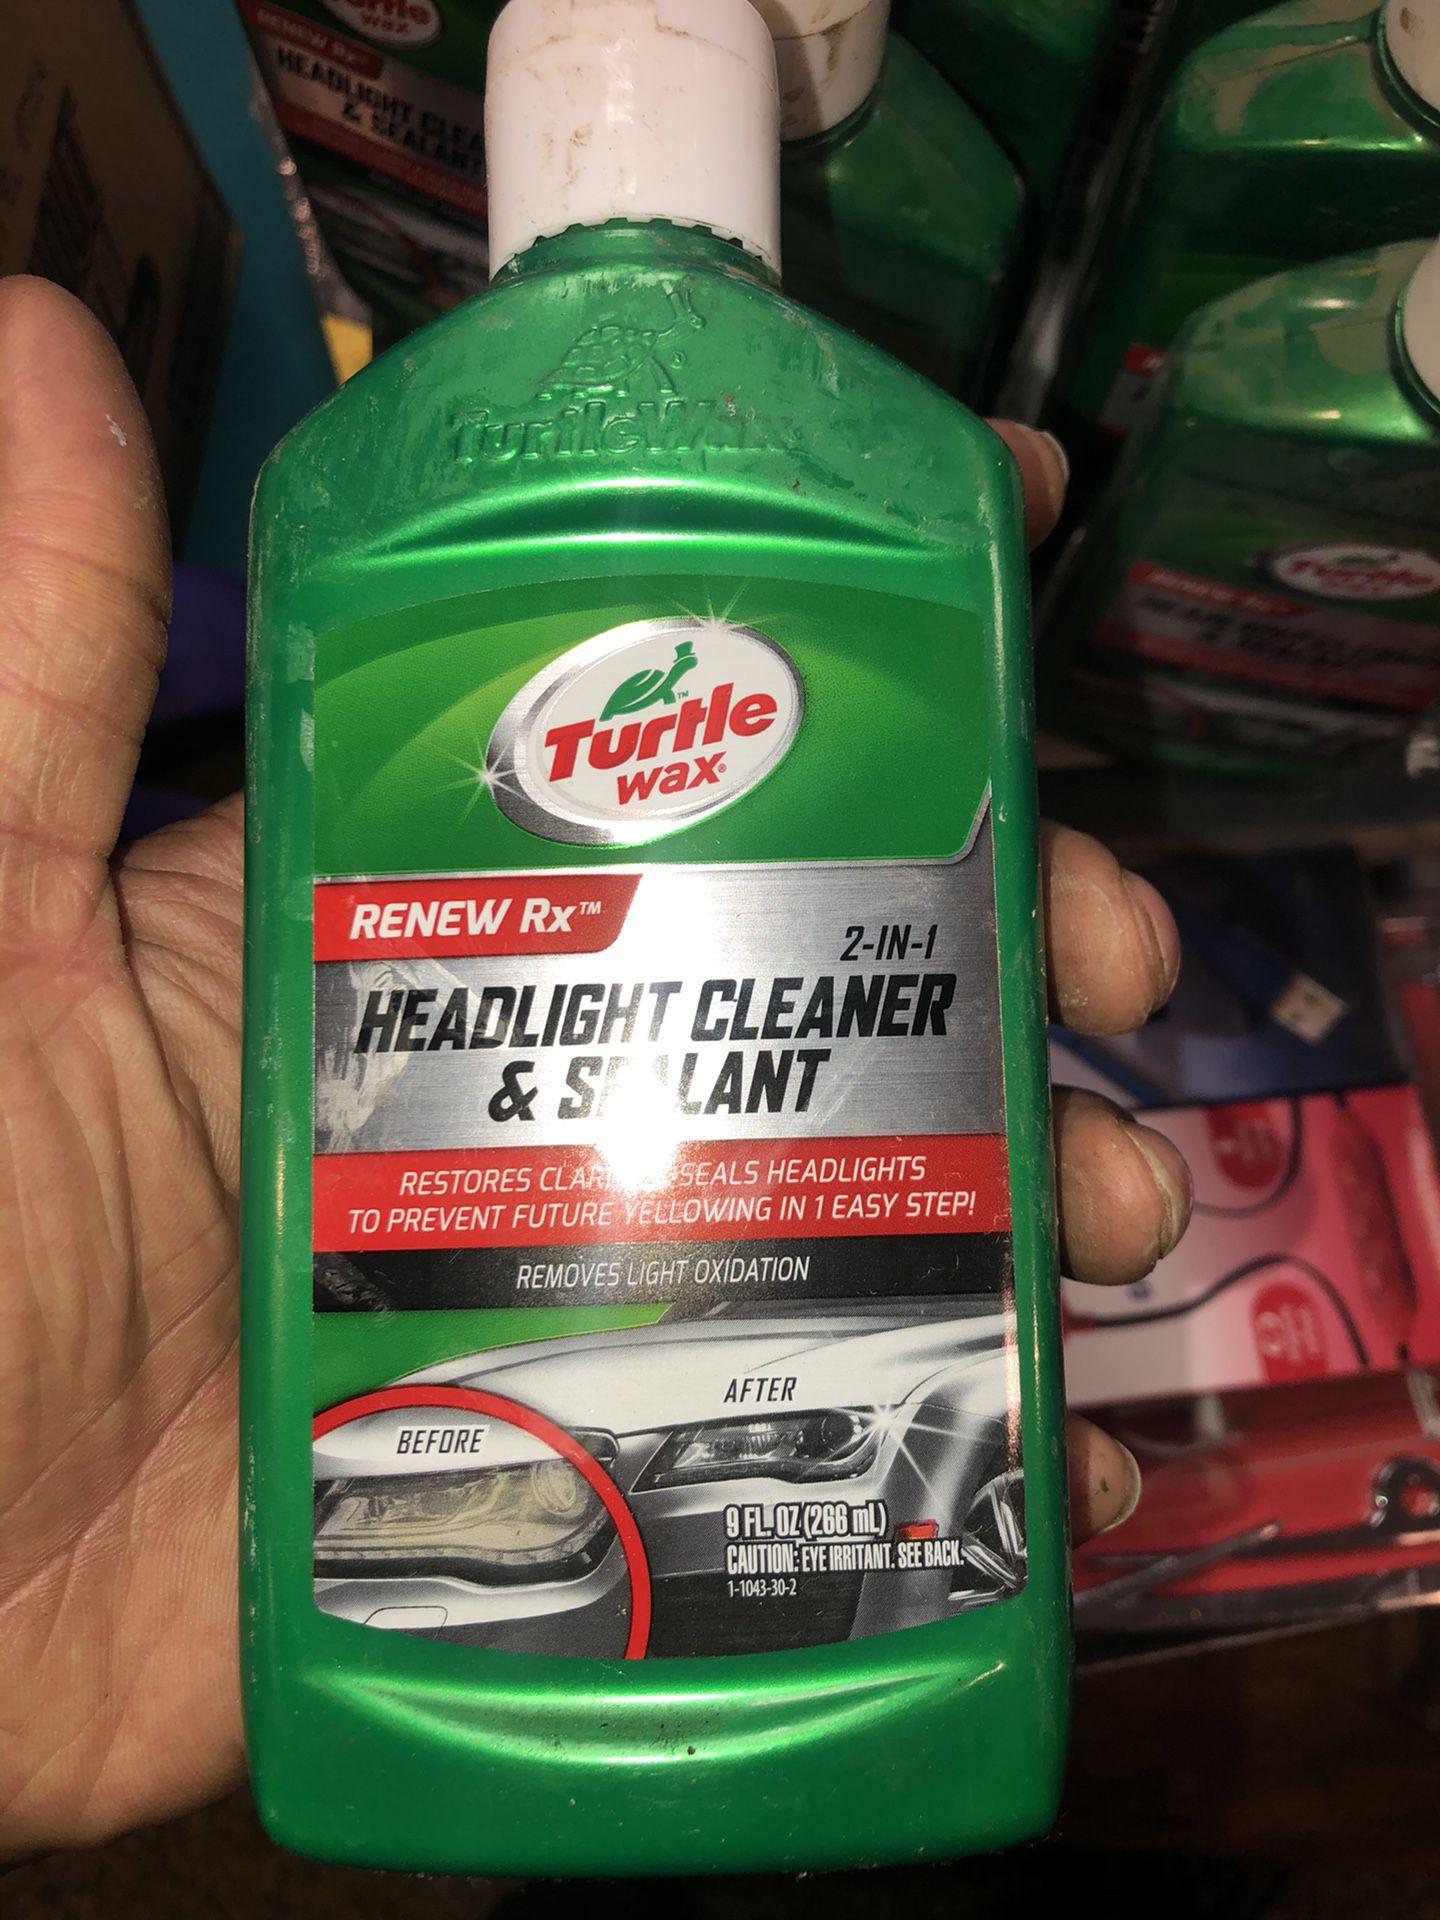 Headlight cleaner